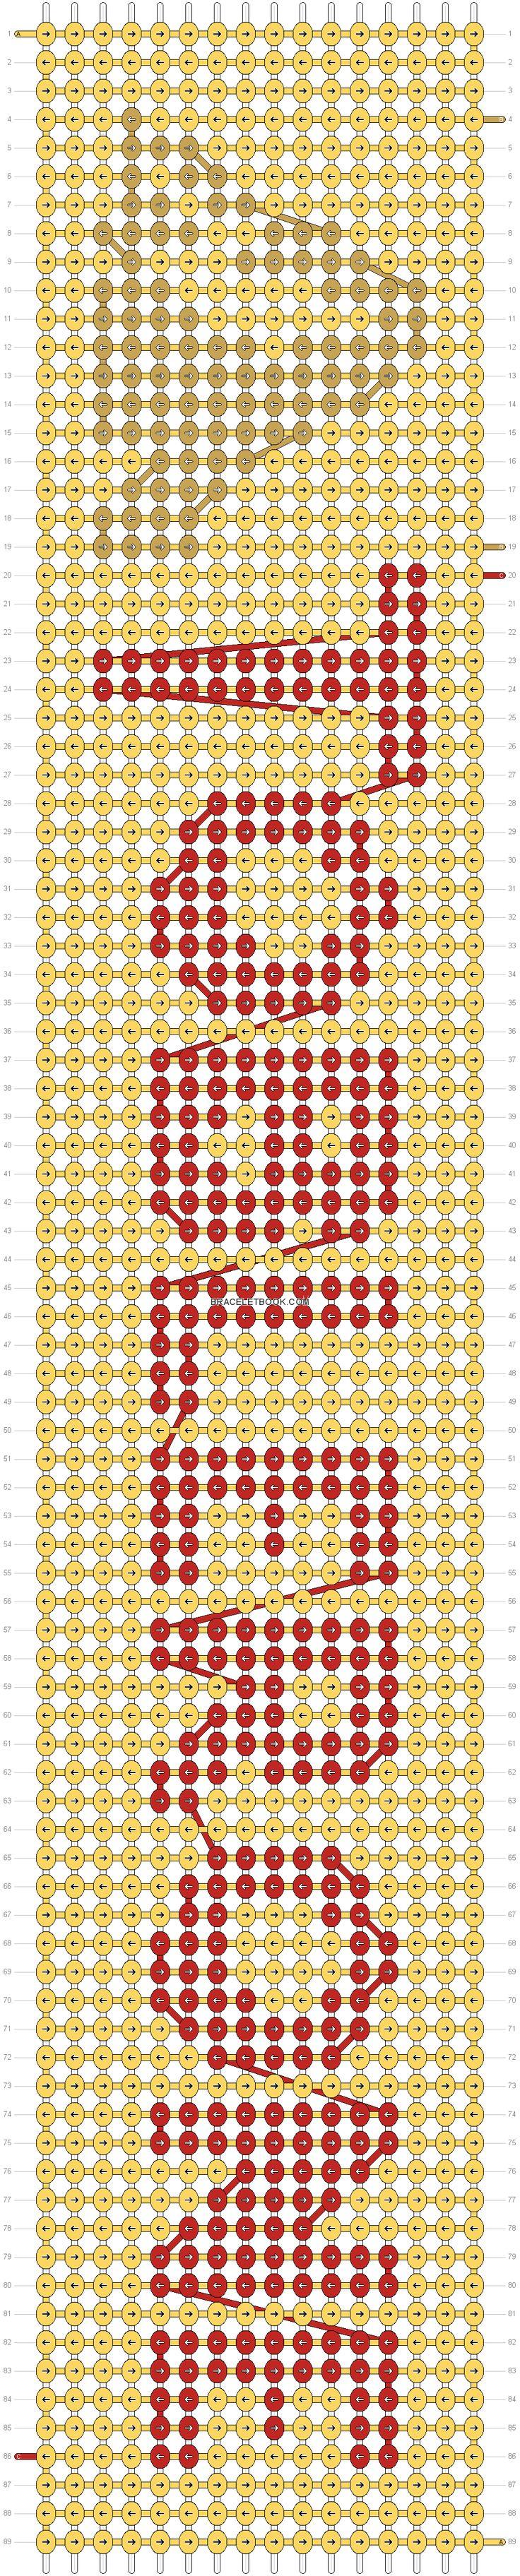 Alpha Pattern #20327 added by chantii97